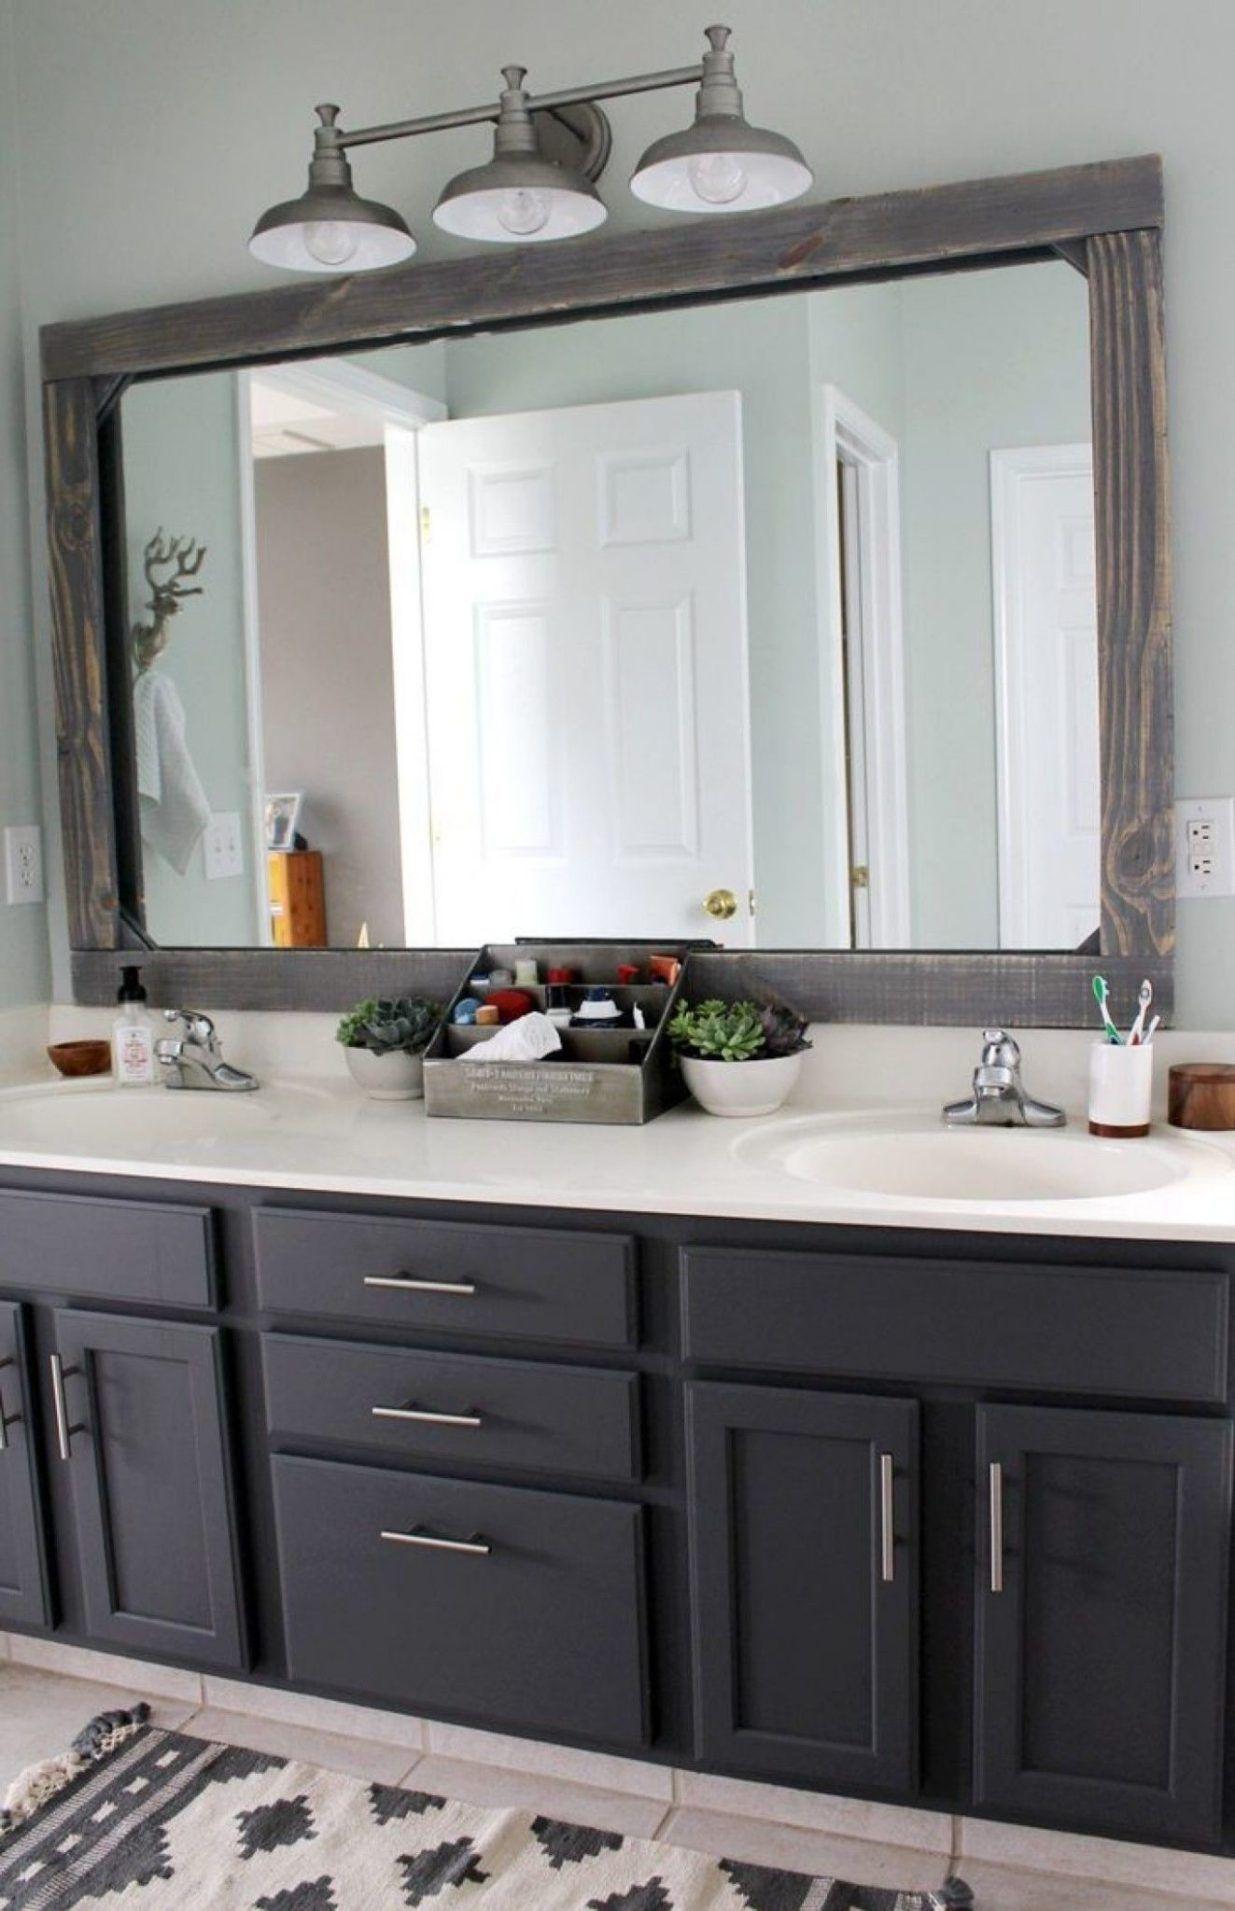 20 Framed Bathroom Mirror Ideas For Double Vanity Single Sink With Light Bathroom Cabinet Makeover Diy Bathroom Makeover Master Bathroom Makeover [ 1911 x 1235 Pixel ]